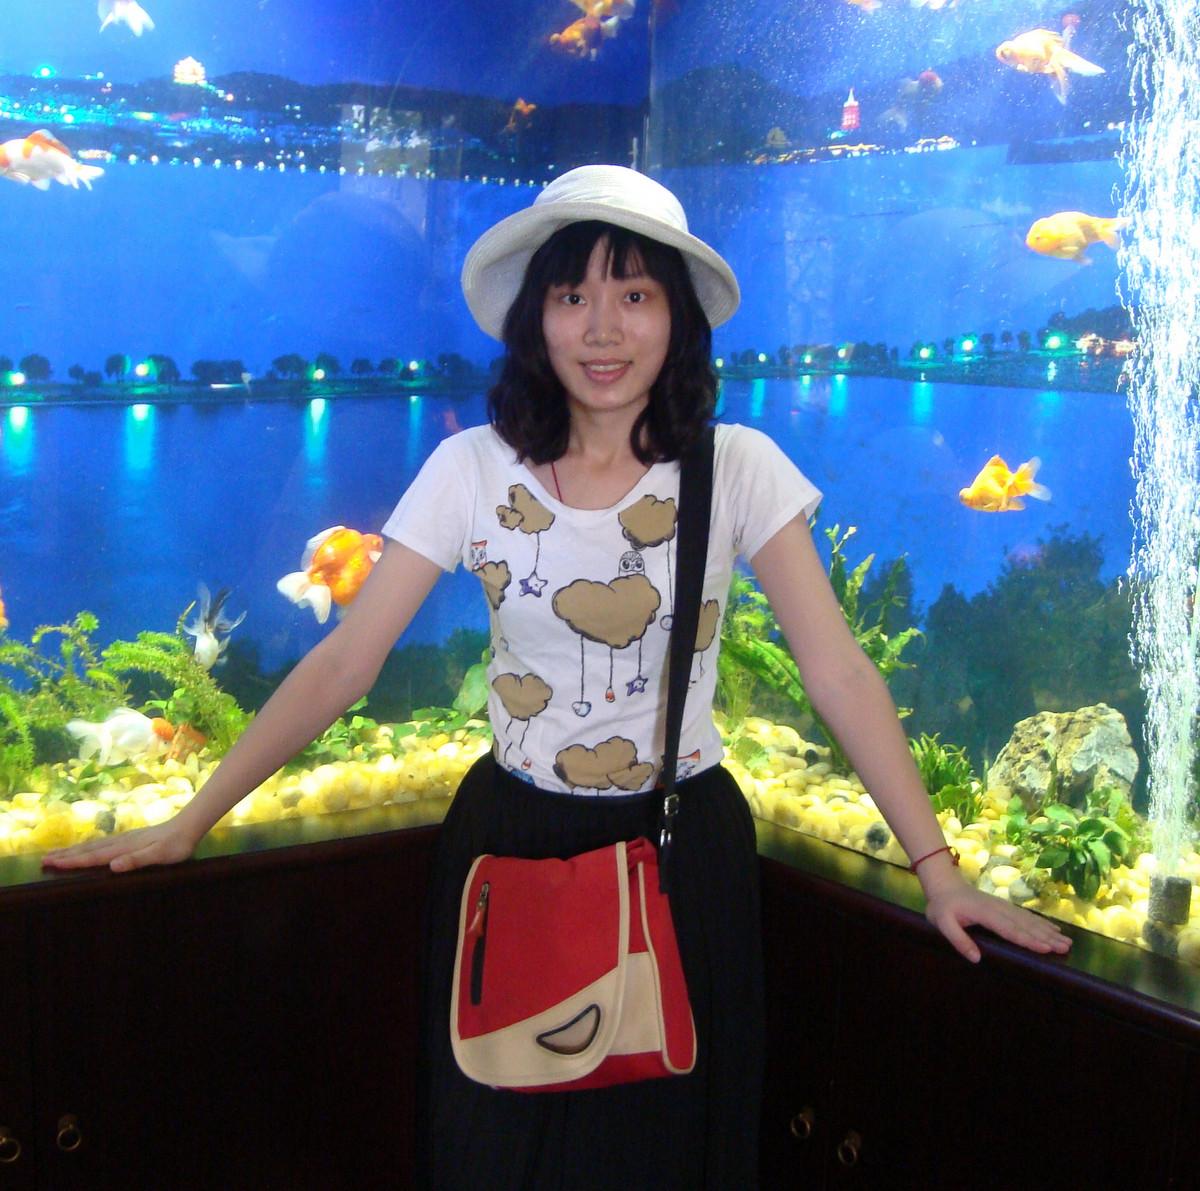 Eunice Woo